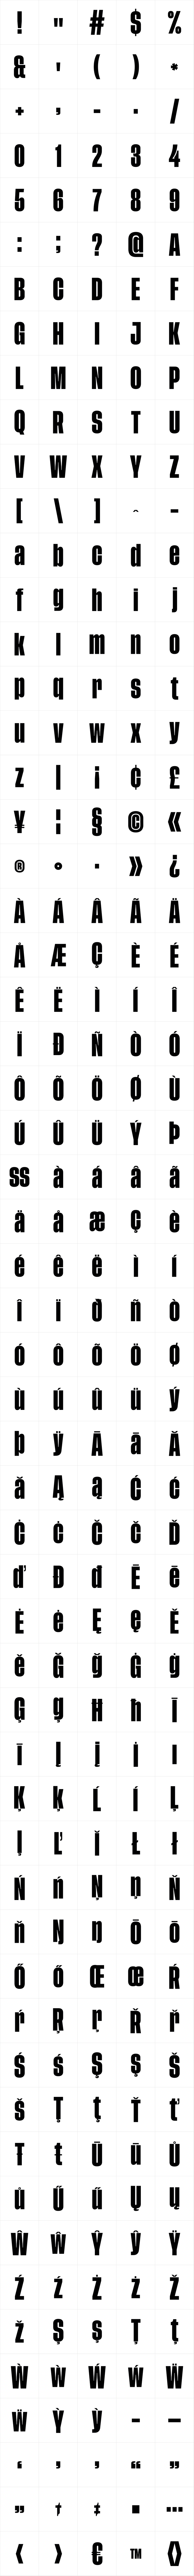 Tusker Grotesk 4700 Bold